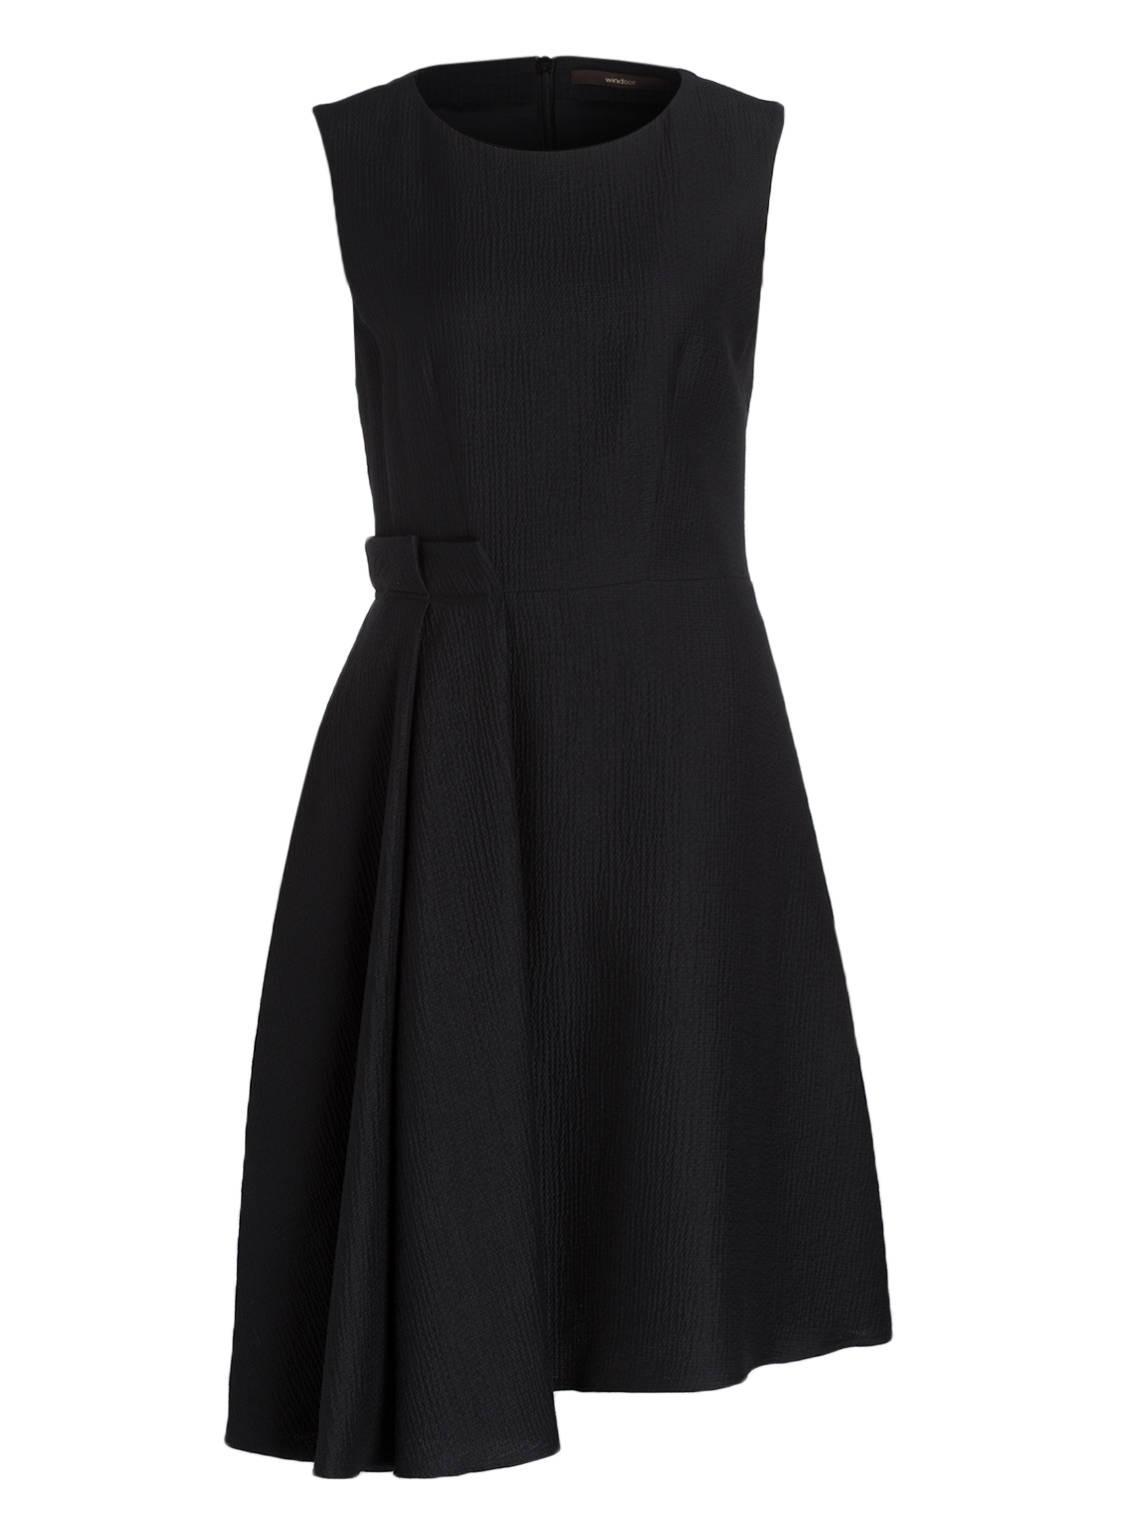 10 Großartig Damen Kleider Online Shop Bester PreisFormal Cool Damen Kleider Online Shop Galerie